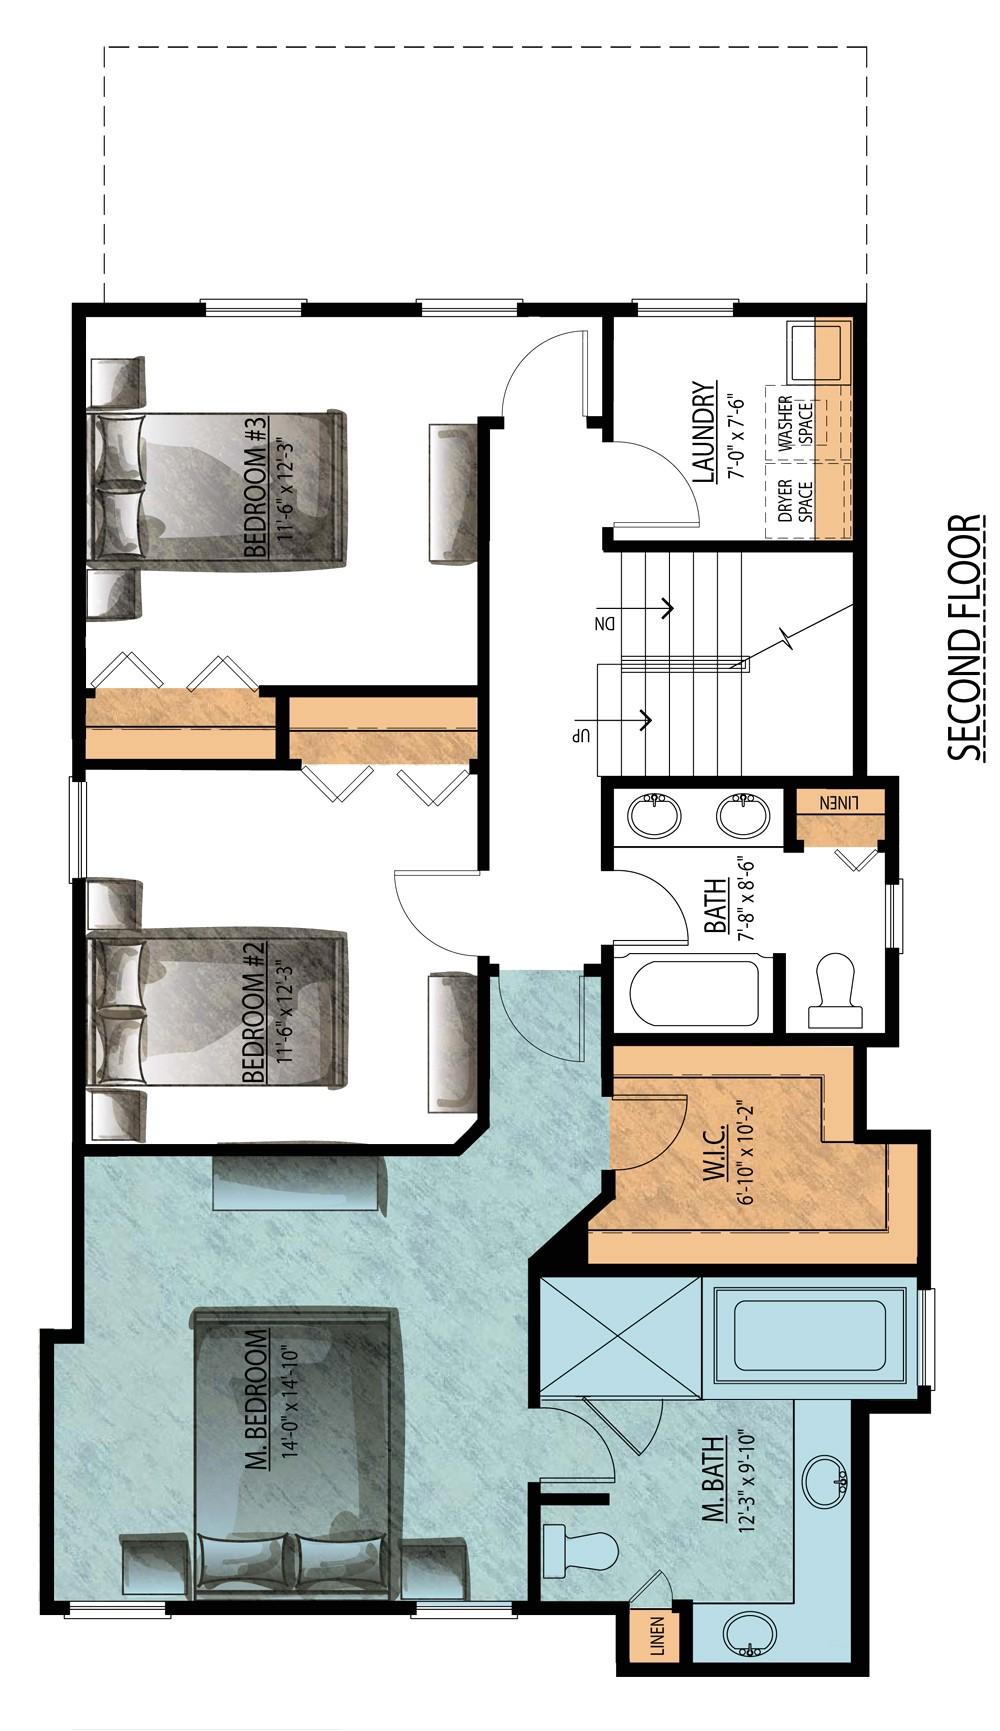 mi homes ranch floor plans beautiful 30 inspirational mi homes floor plans